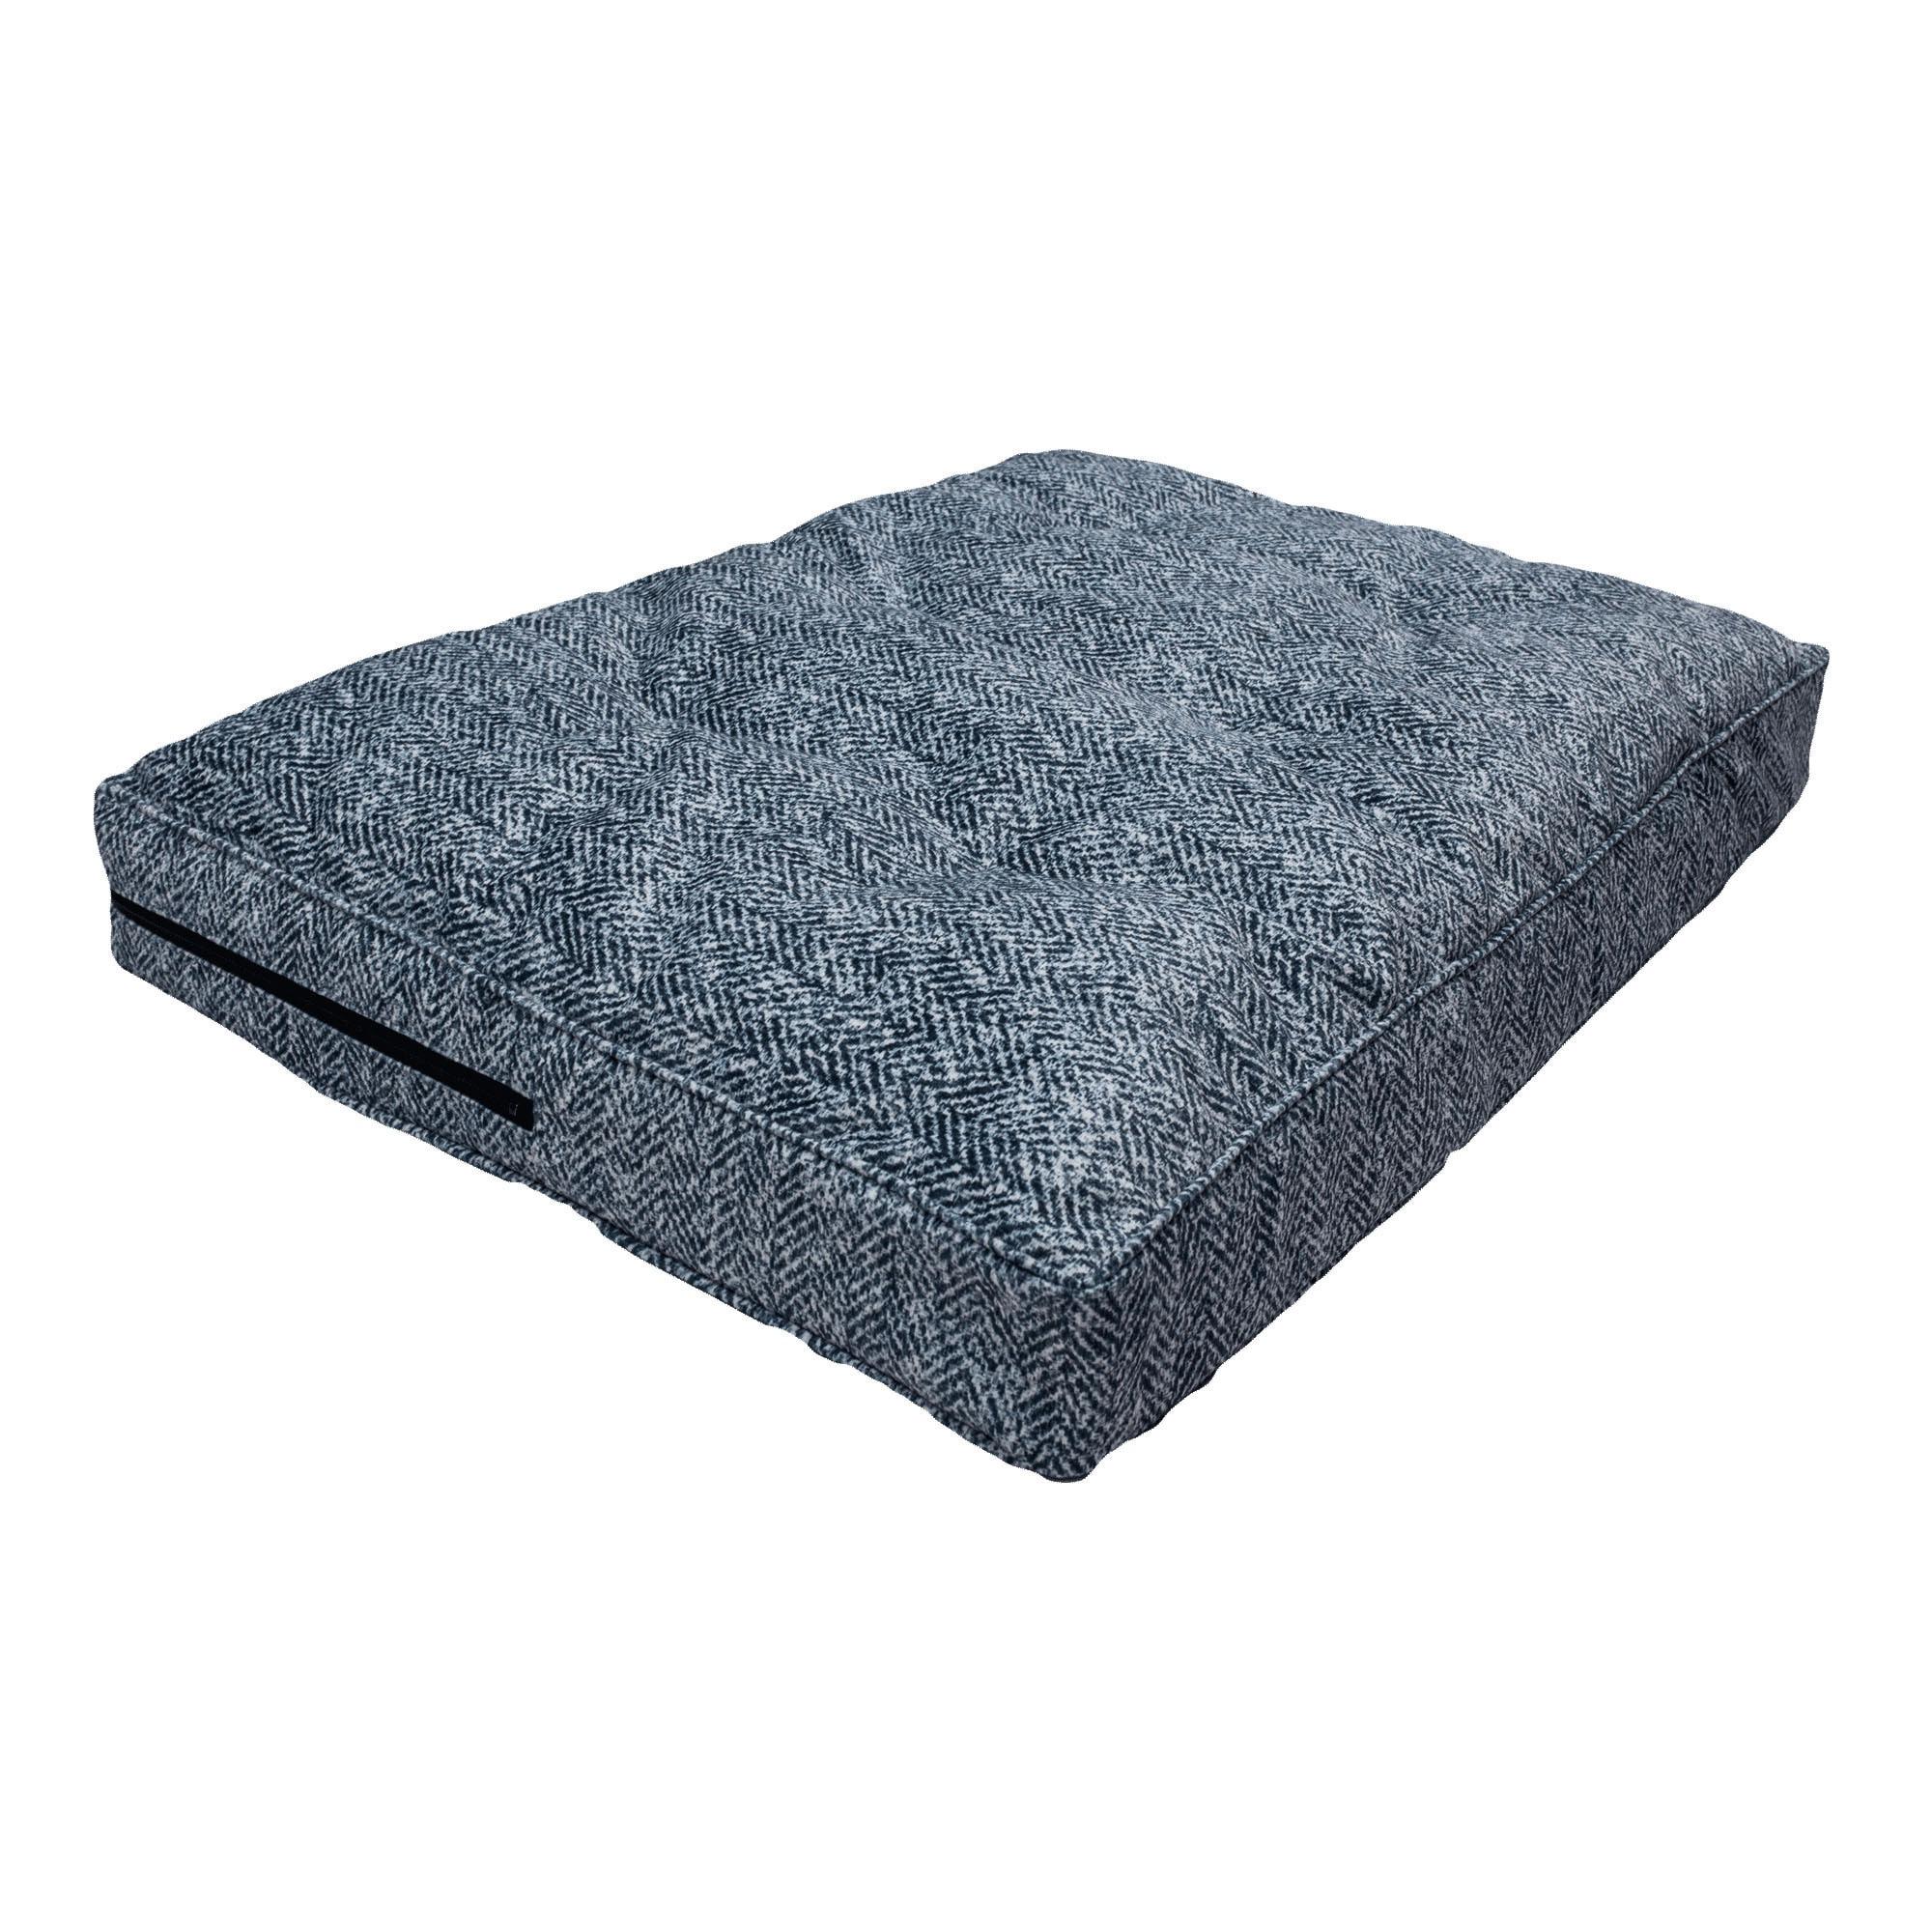 Snoozer Premium Orthopedic Pillow Top Palmer Indigo Pet B...